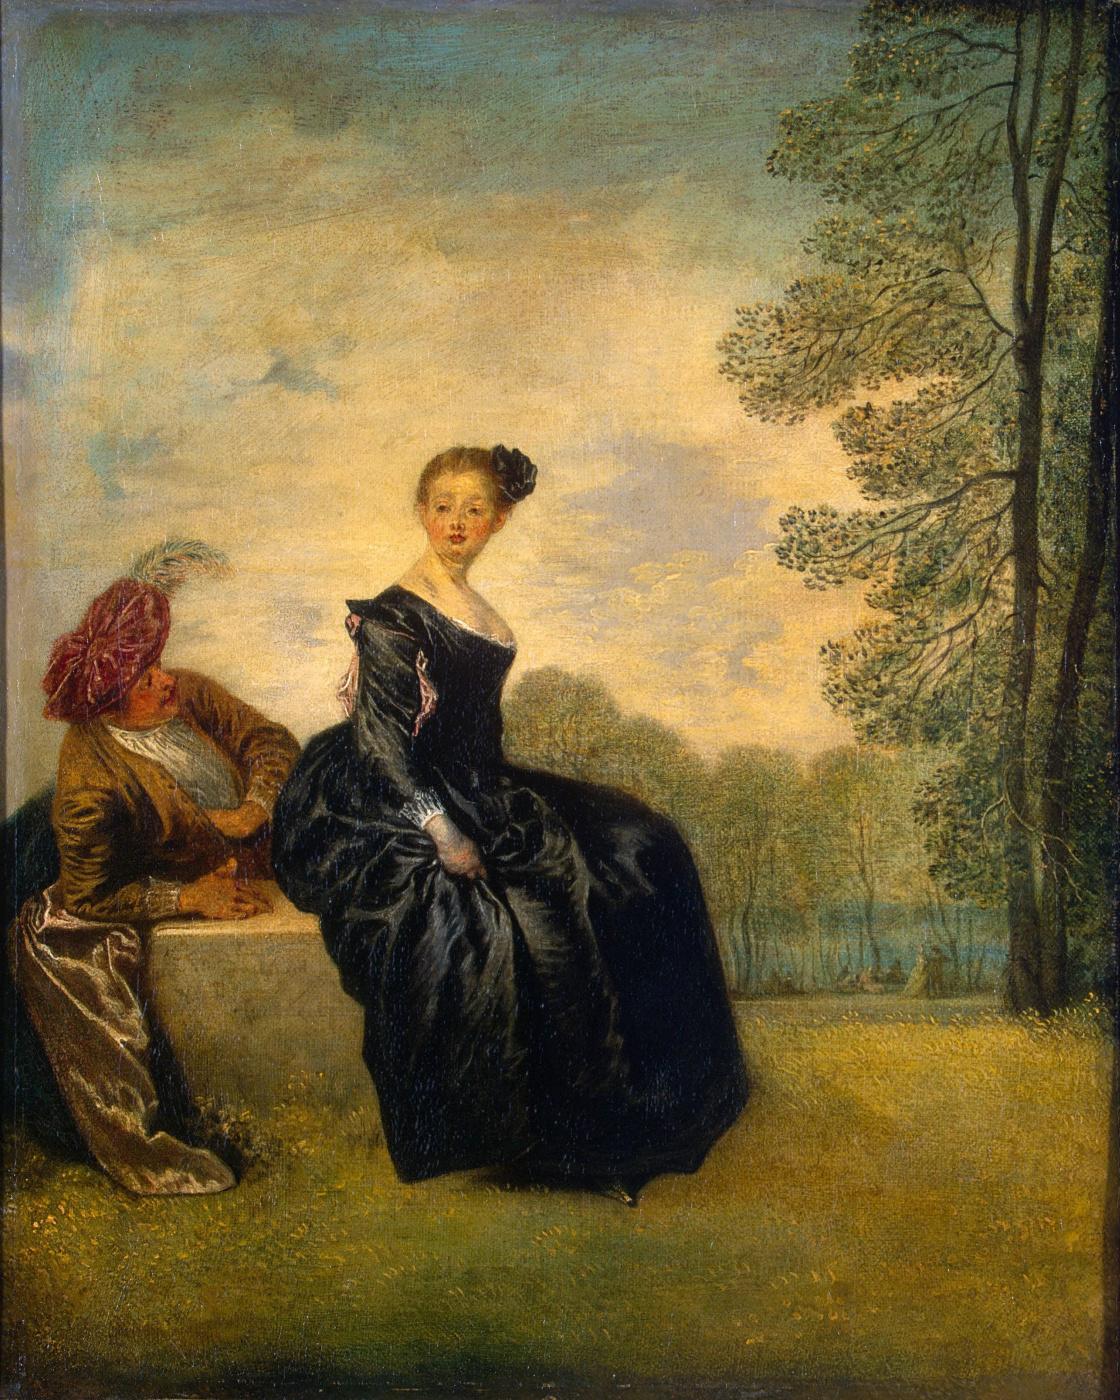 Antoine Watteau. The Capricious Girl